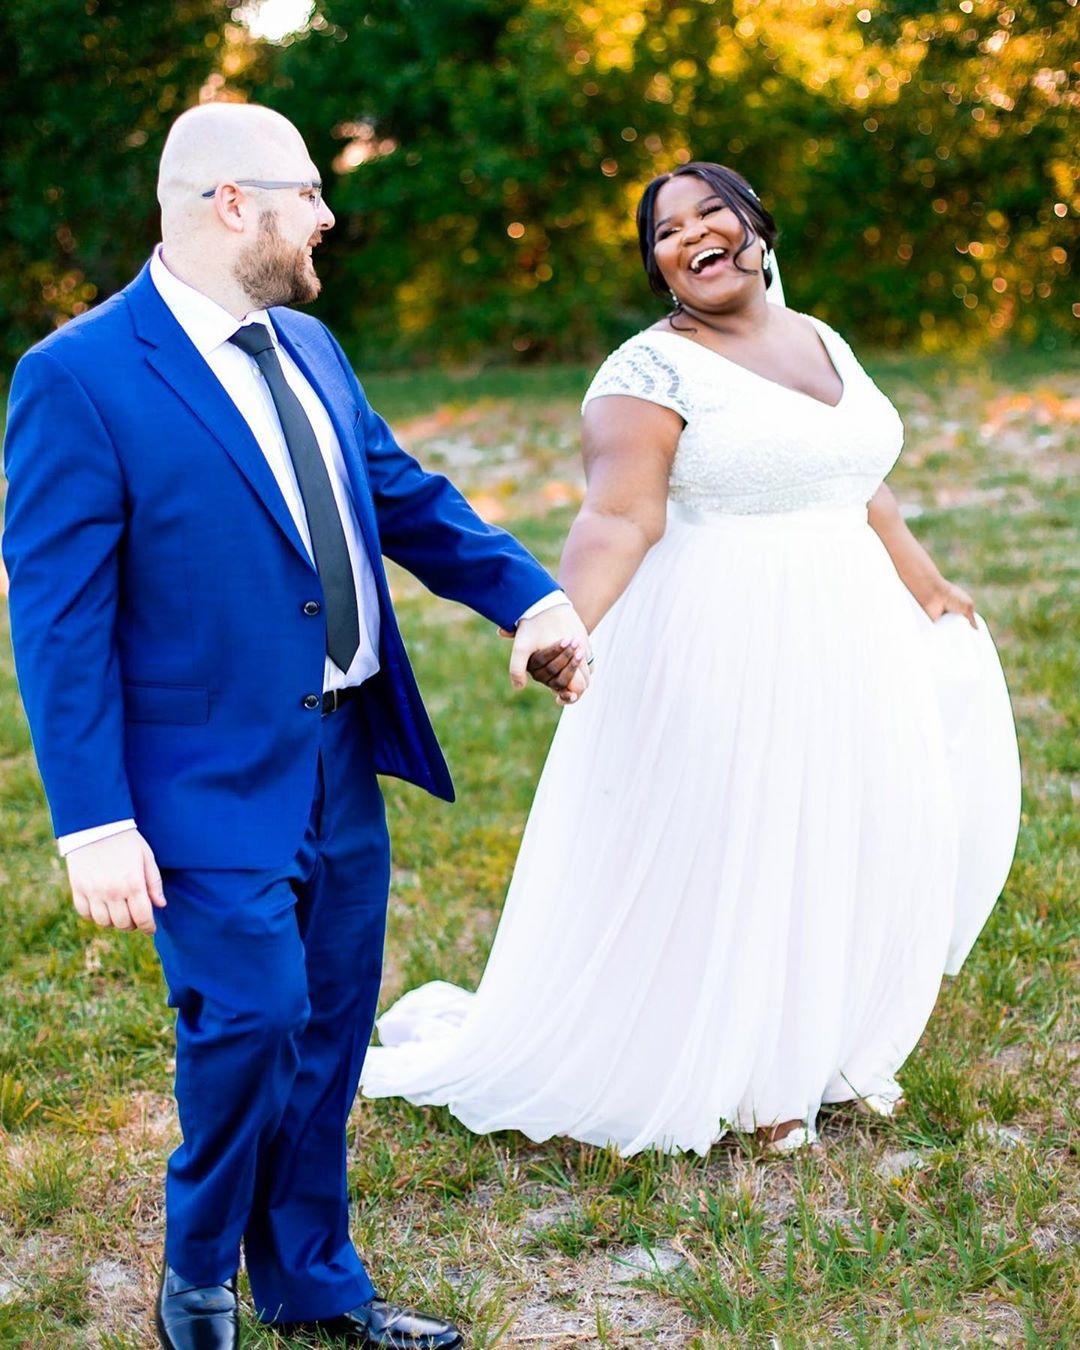 theia wedding gown v neck beaded dress plus size wedding gown